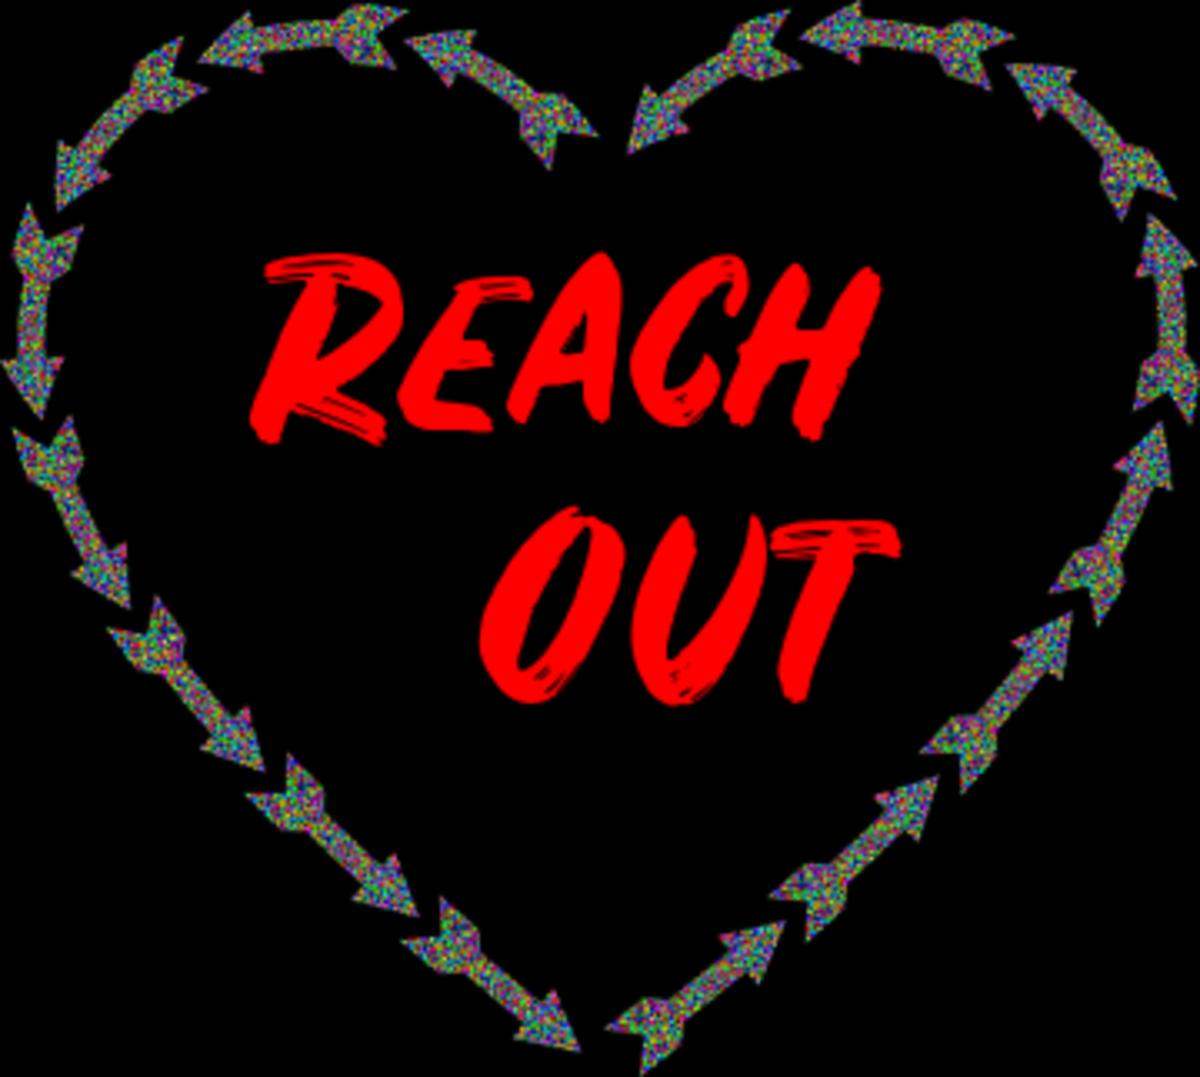 poem-reach-out